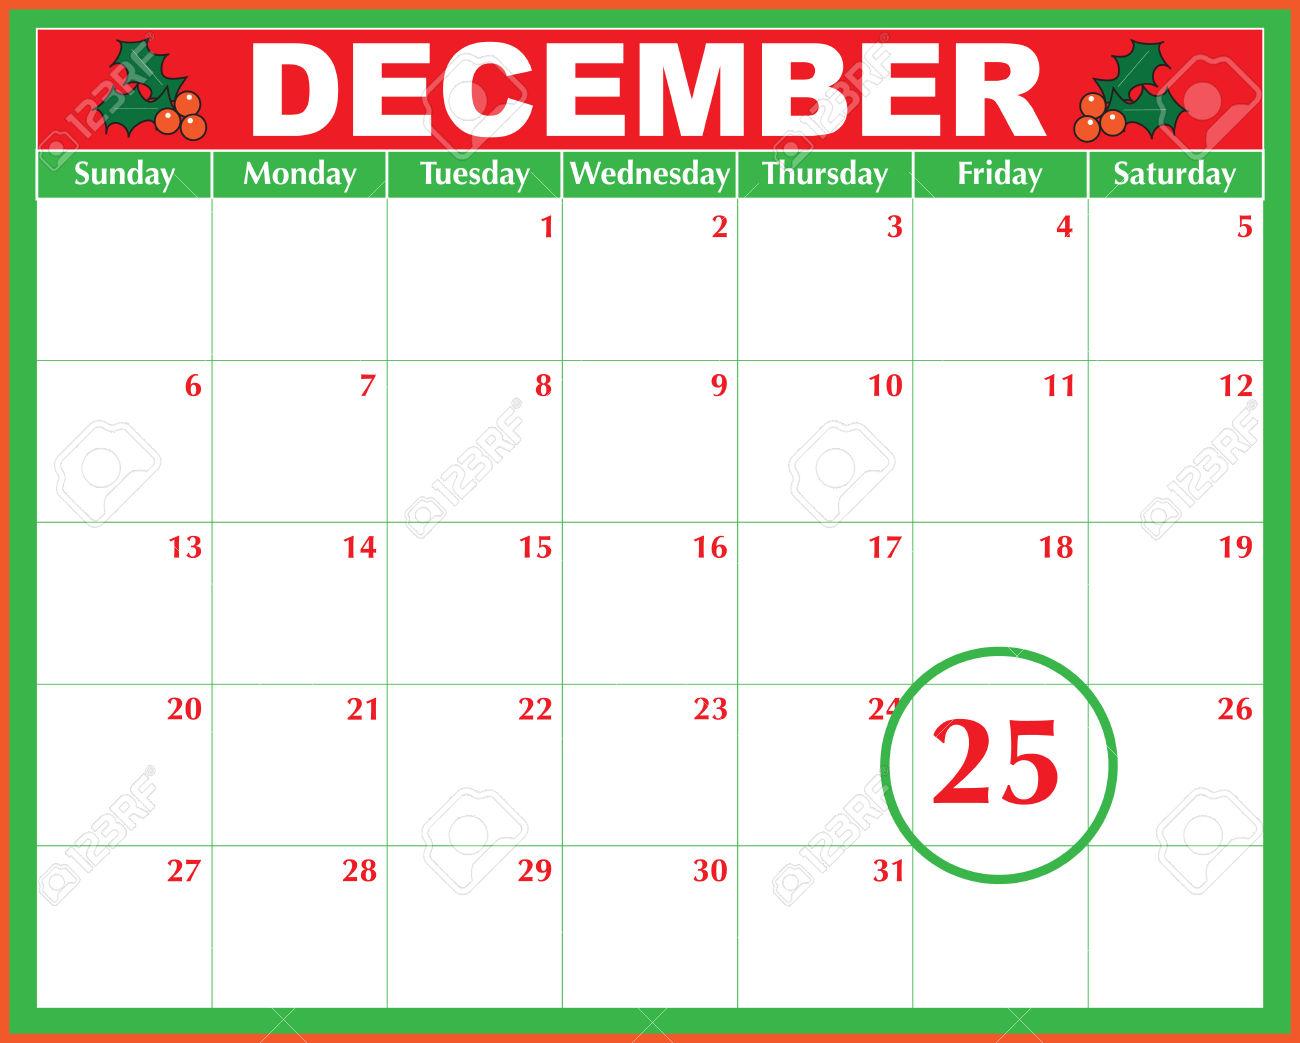 Calendar clipart december 24 vector stock Calendar clipart december 24 1971 - ClipartFest vector stock